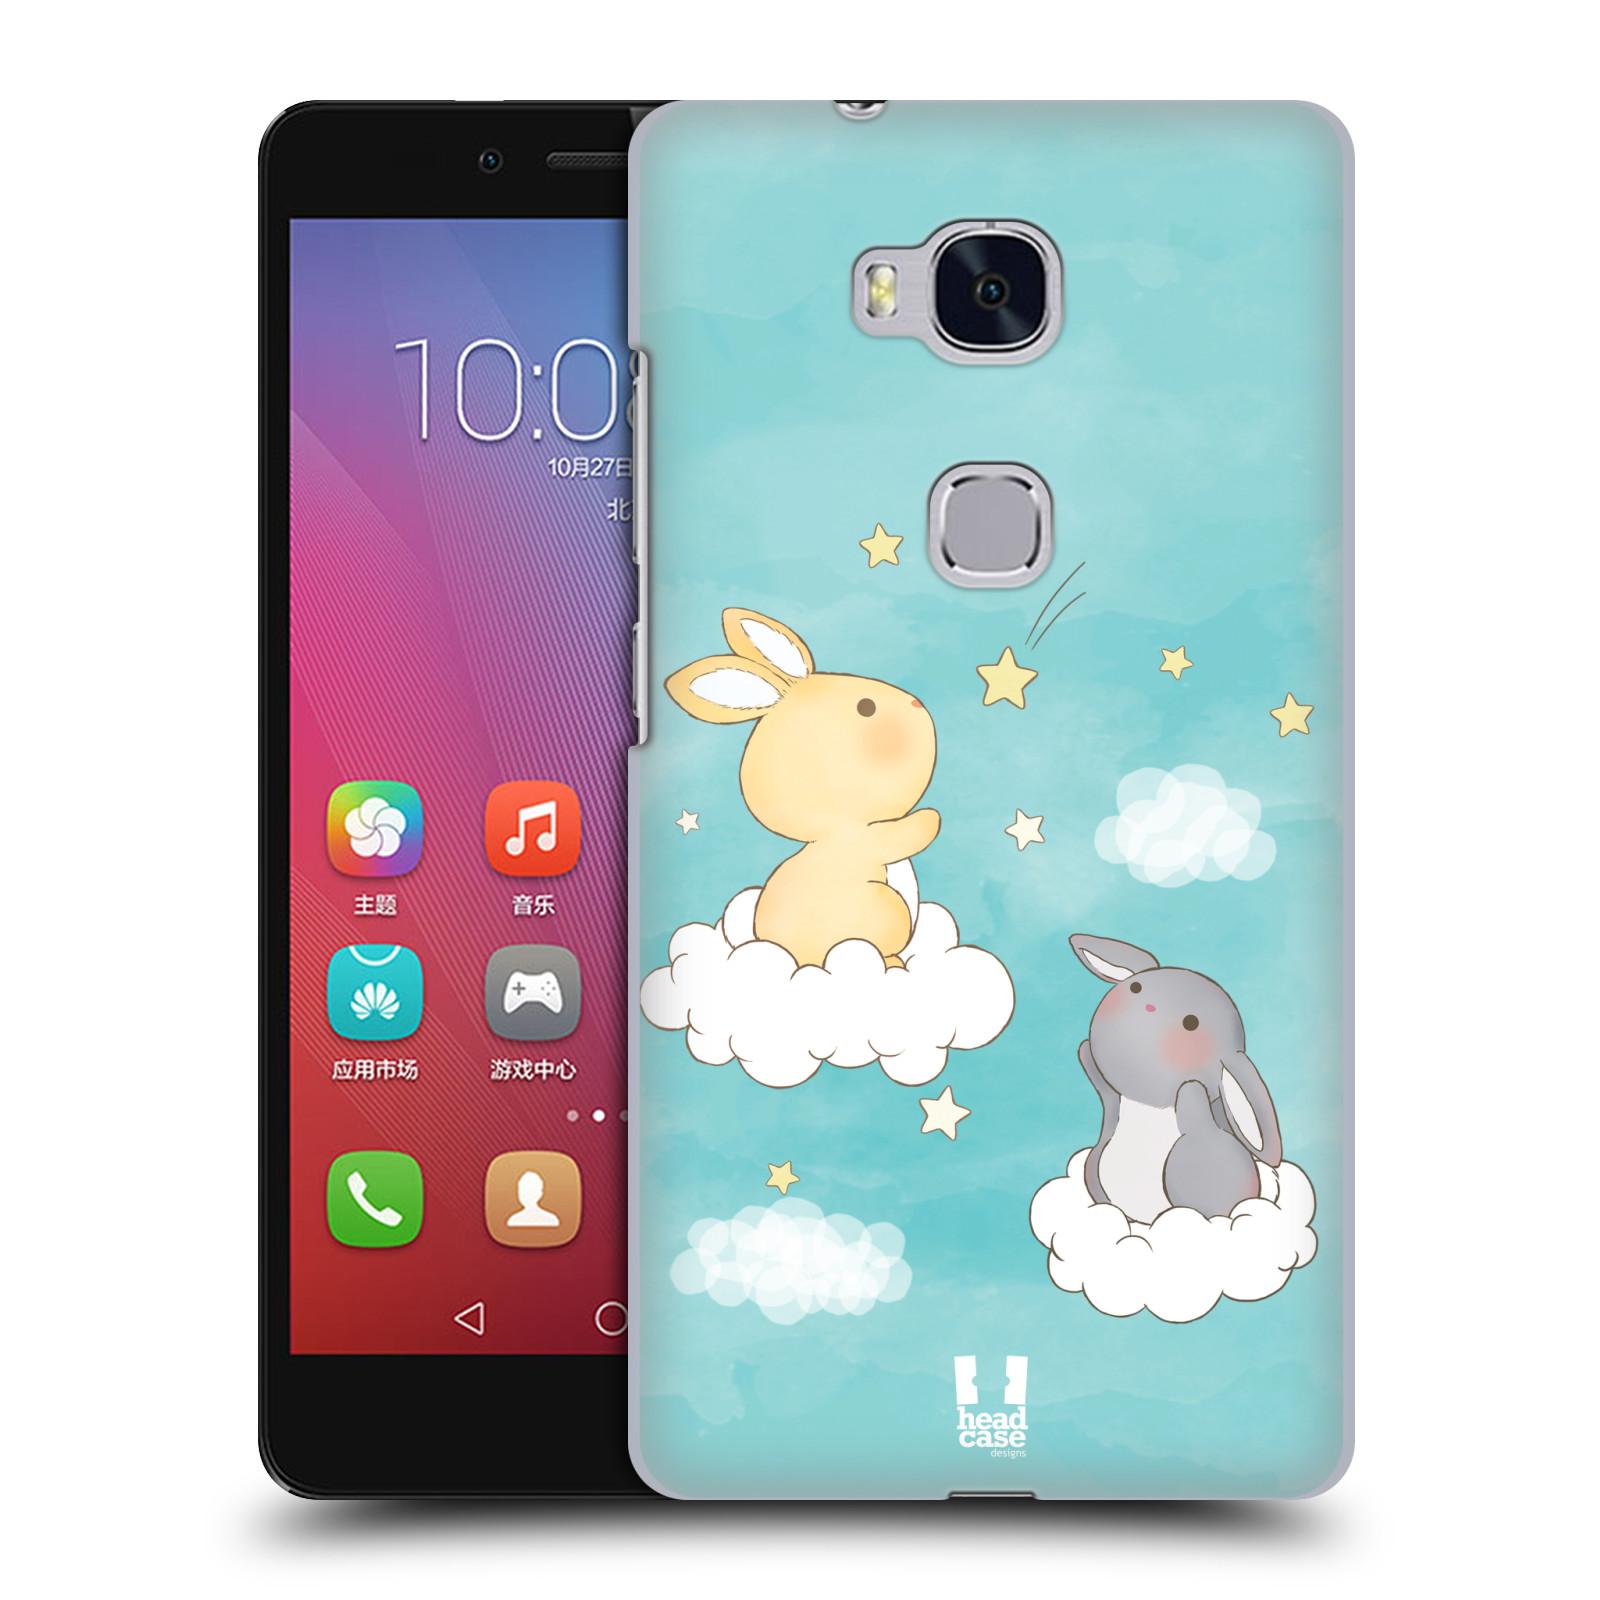 HEAD CASE pevný plastový obal na mobil HUAWEI HONOR 5X vzor králíček a hvězdy modrá